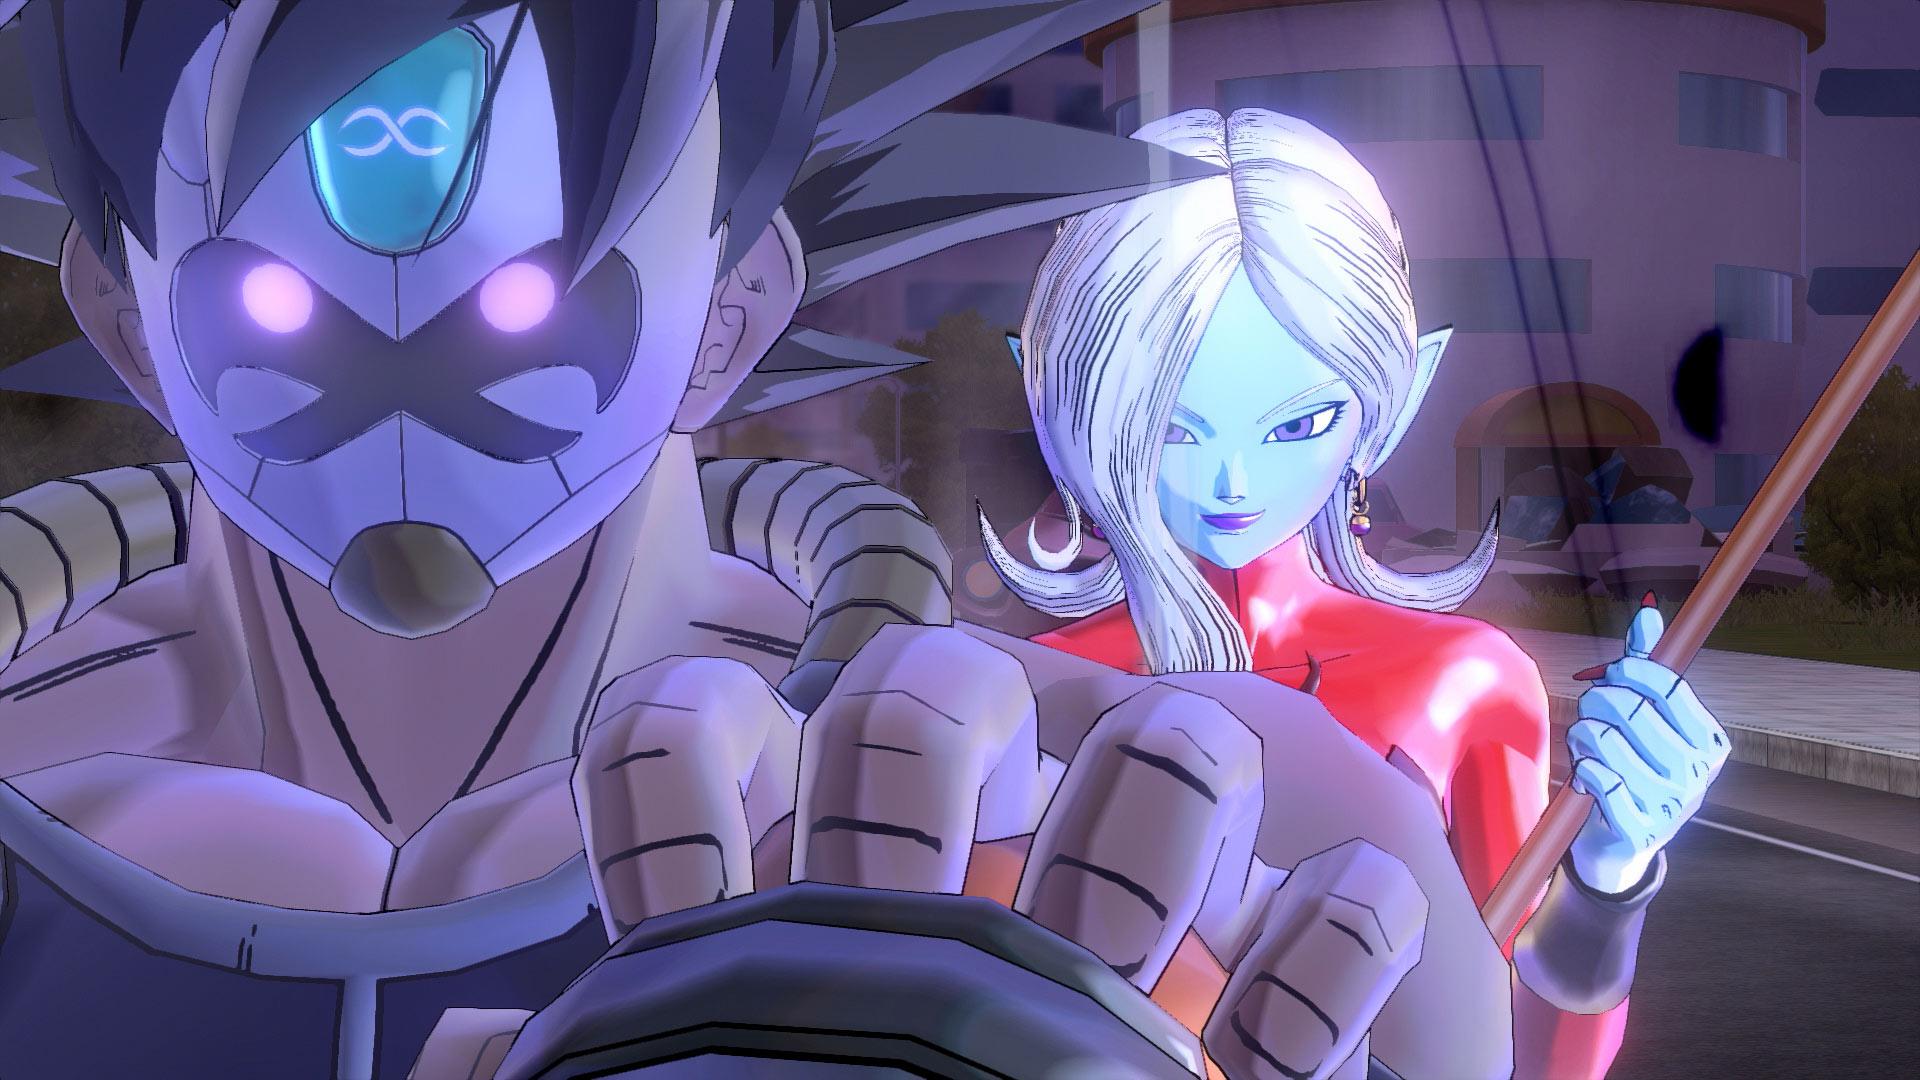 Dragon Ball Xenoverse 2 ESPAÑOL Descargar Full (CODEX) + REPACK 3 DVD5 (JPW) 10